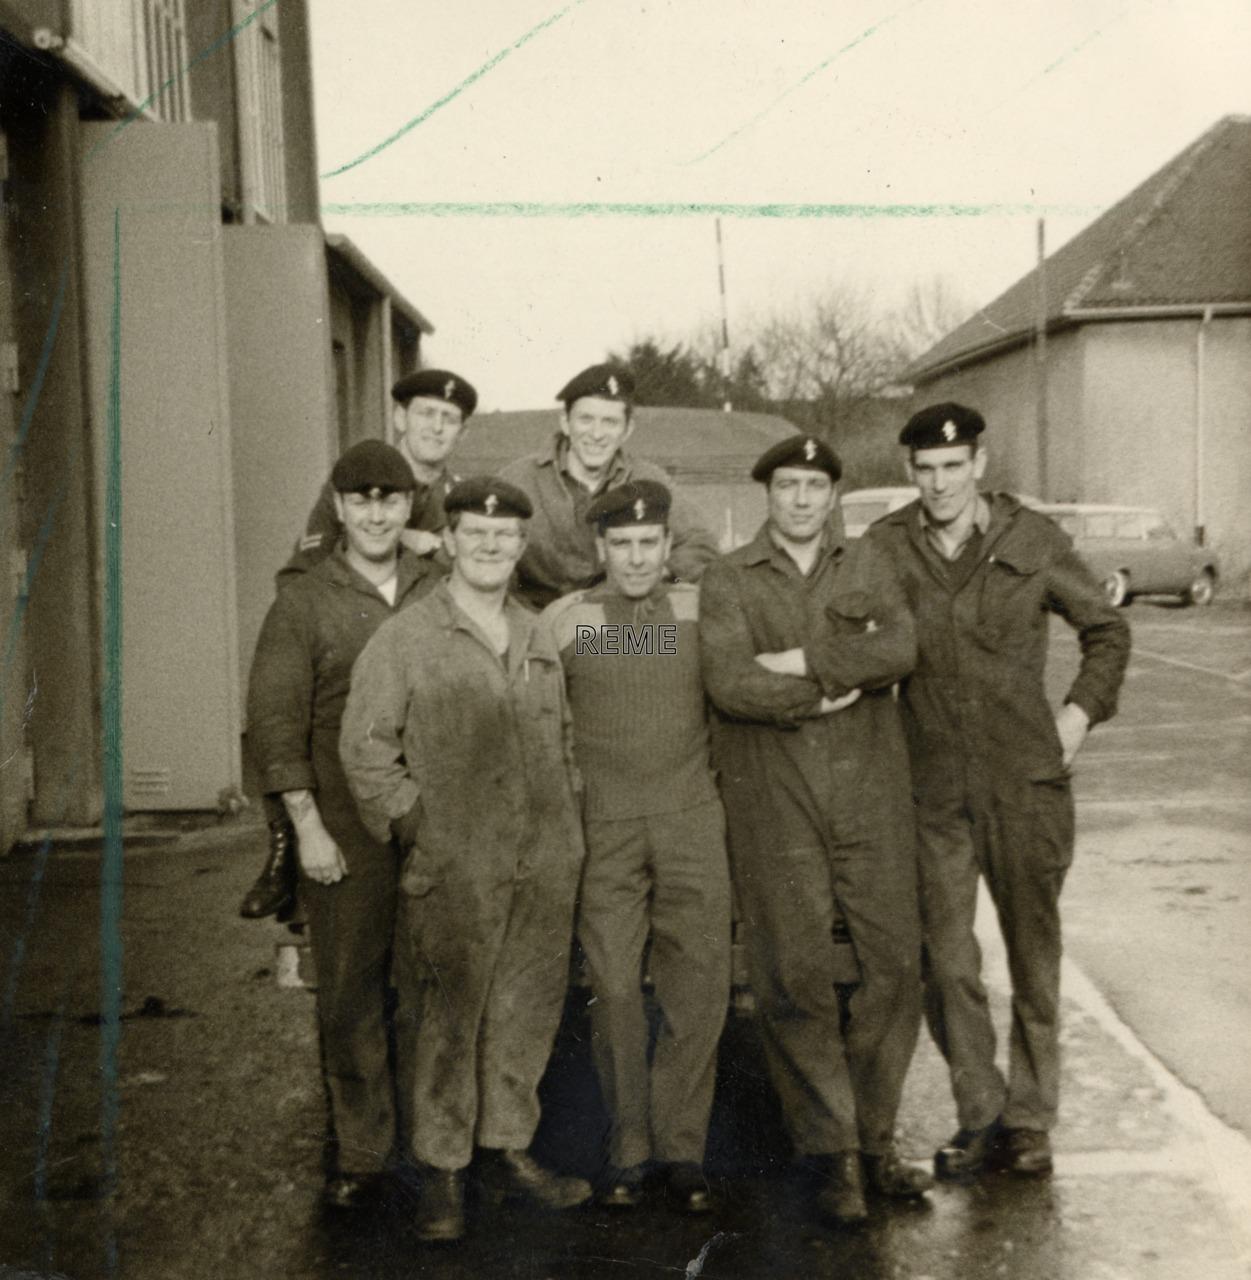 HQ 1 (BR) Corps, Headquarters 1 (British) Corps, and HQ Regt LAD (Headquarters Regimental Light Aid Detachment)